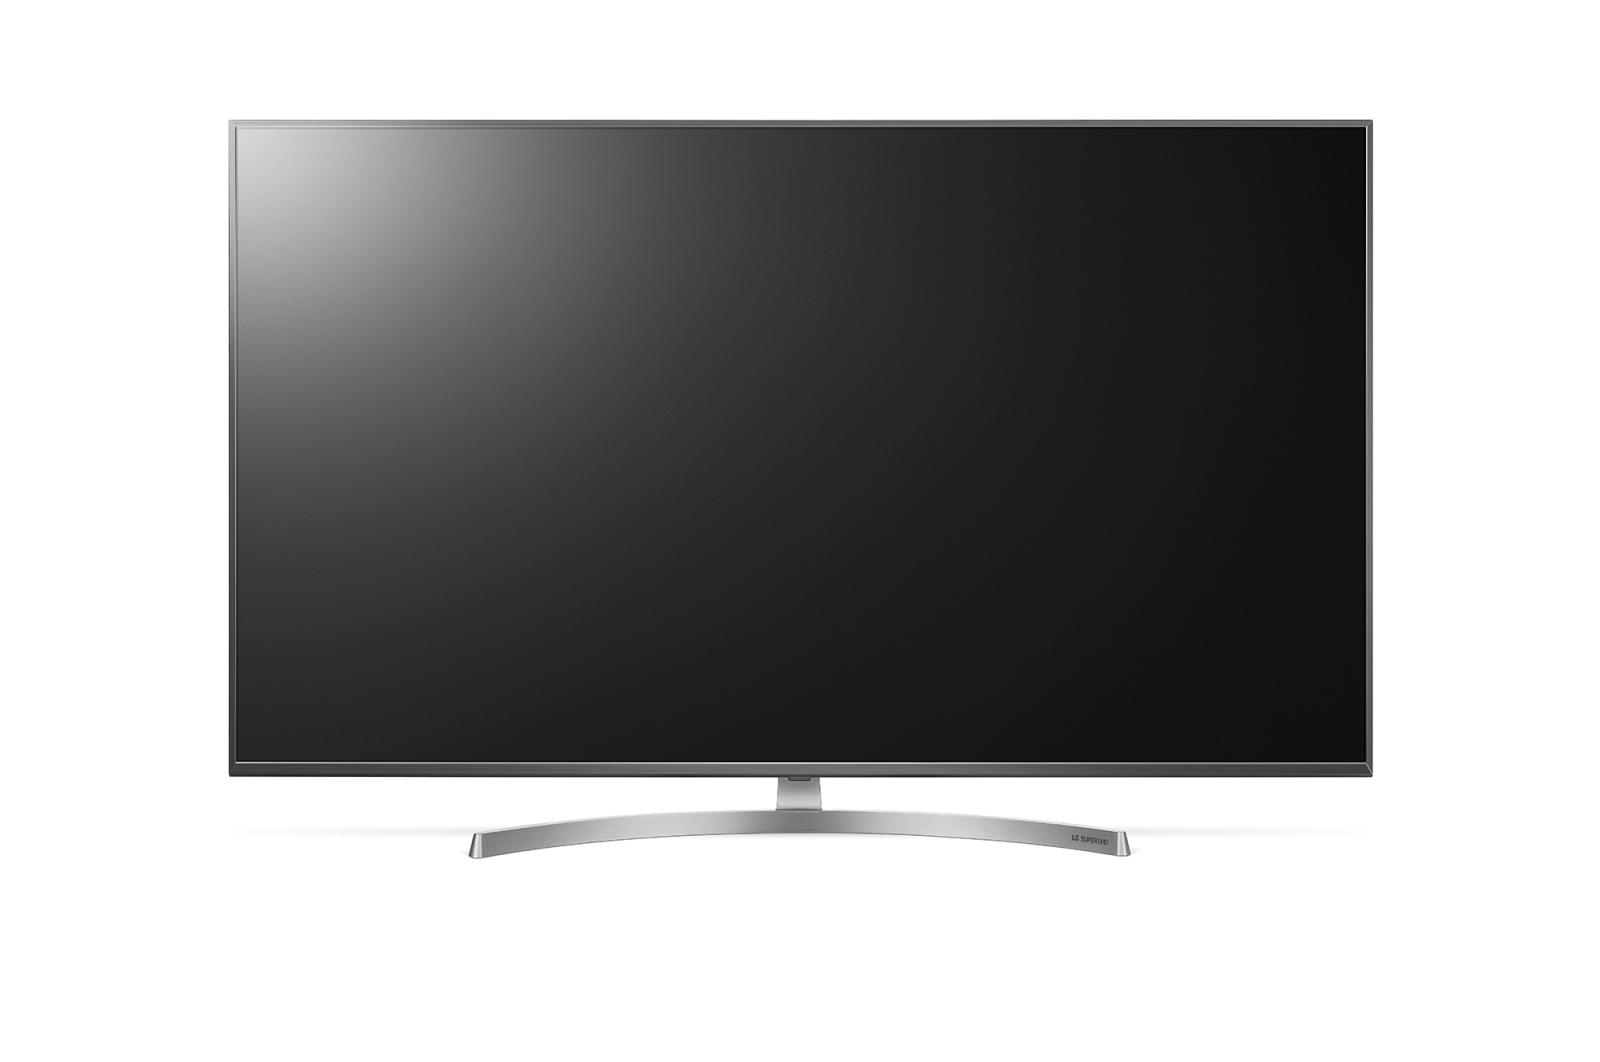 LG 65SK8100 telewizor 4K z AI